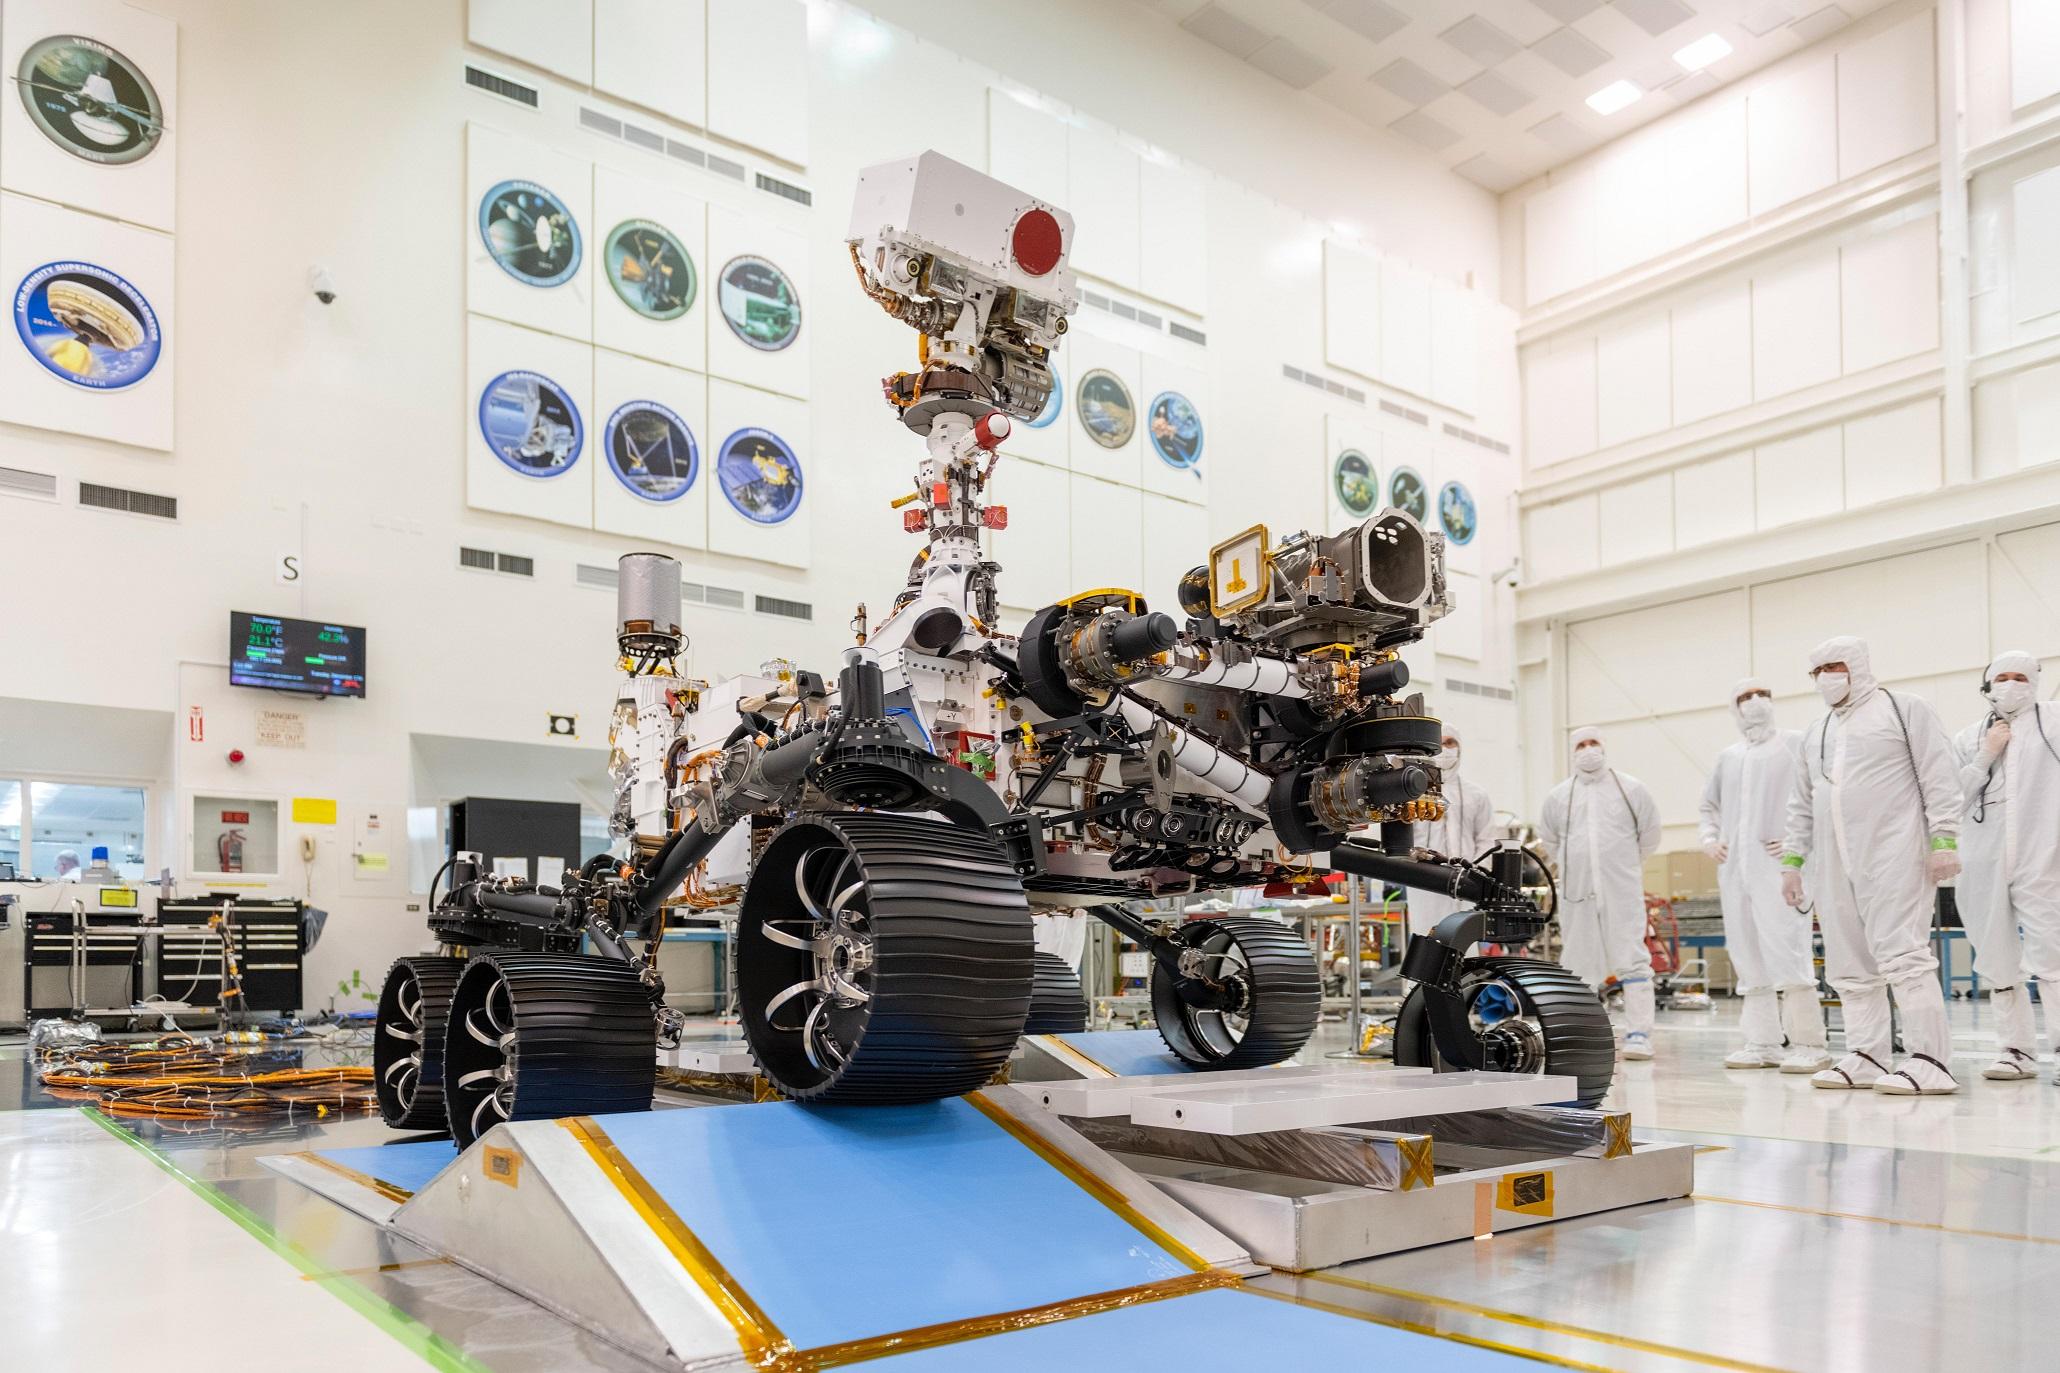 Mars2020 rover roves